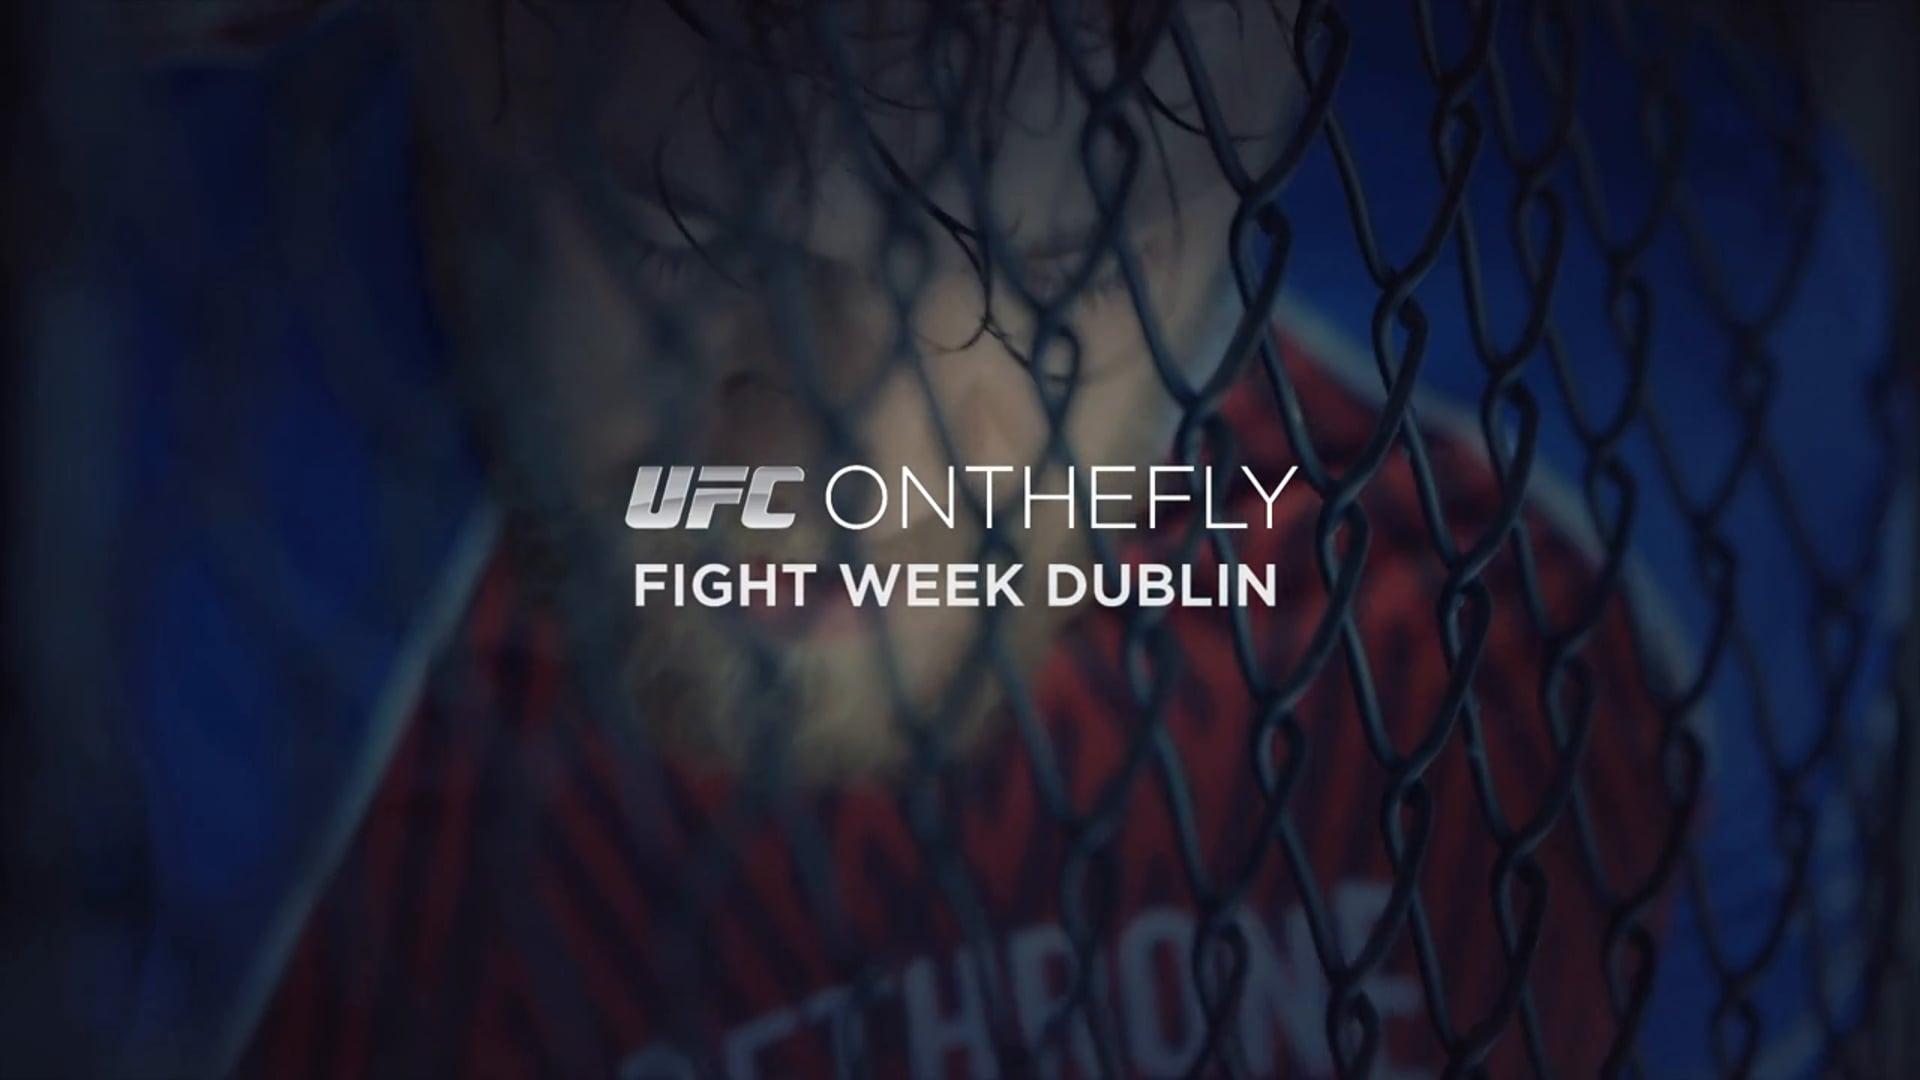 UFC On The Fly: Fight Week Dublin